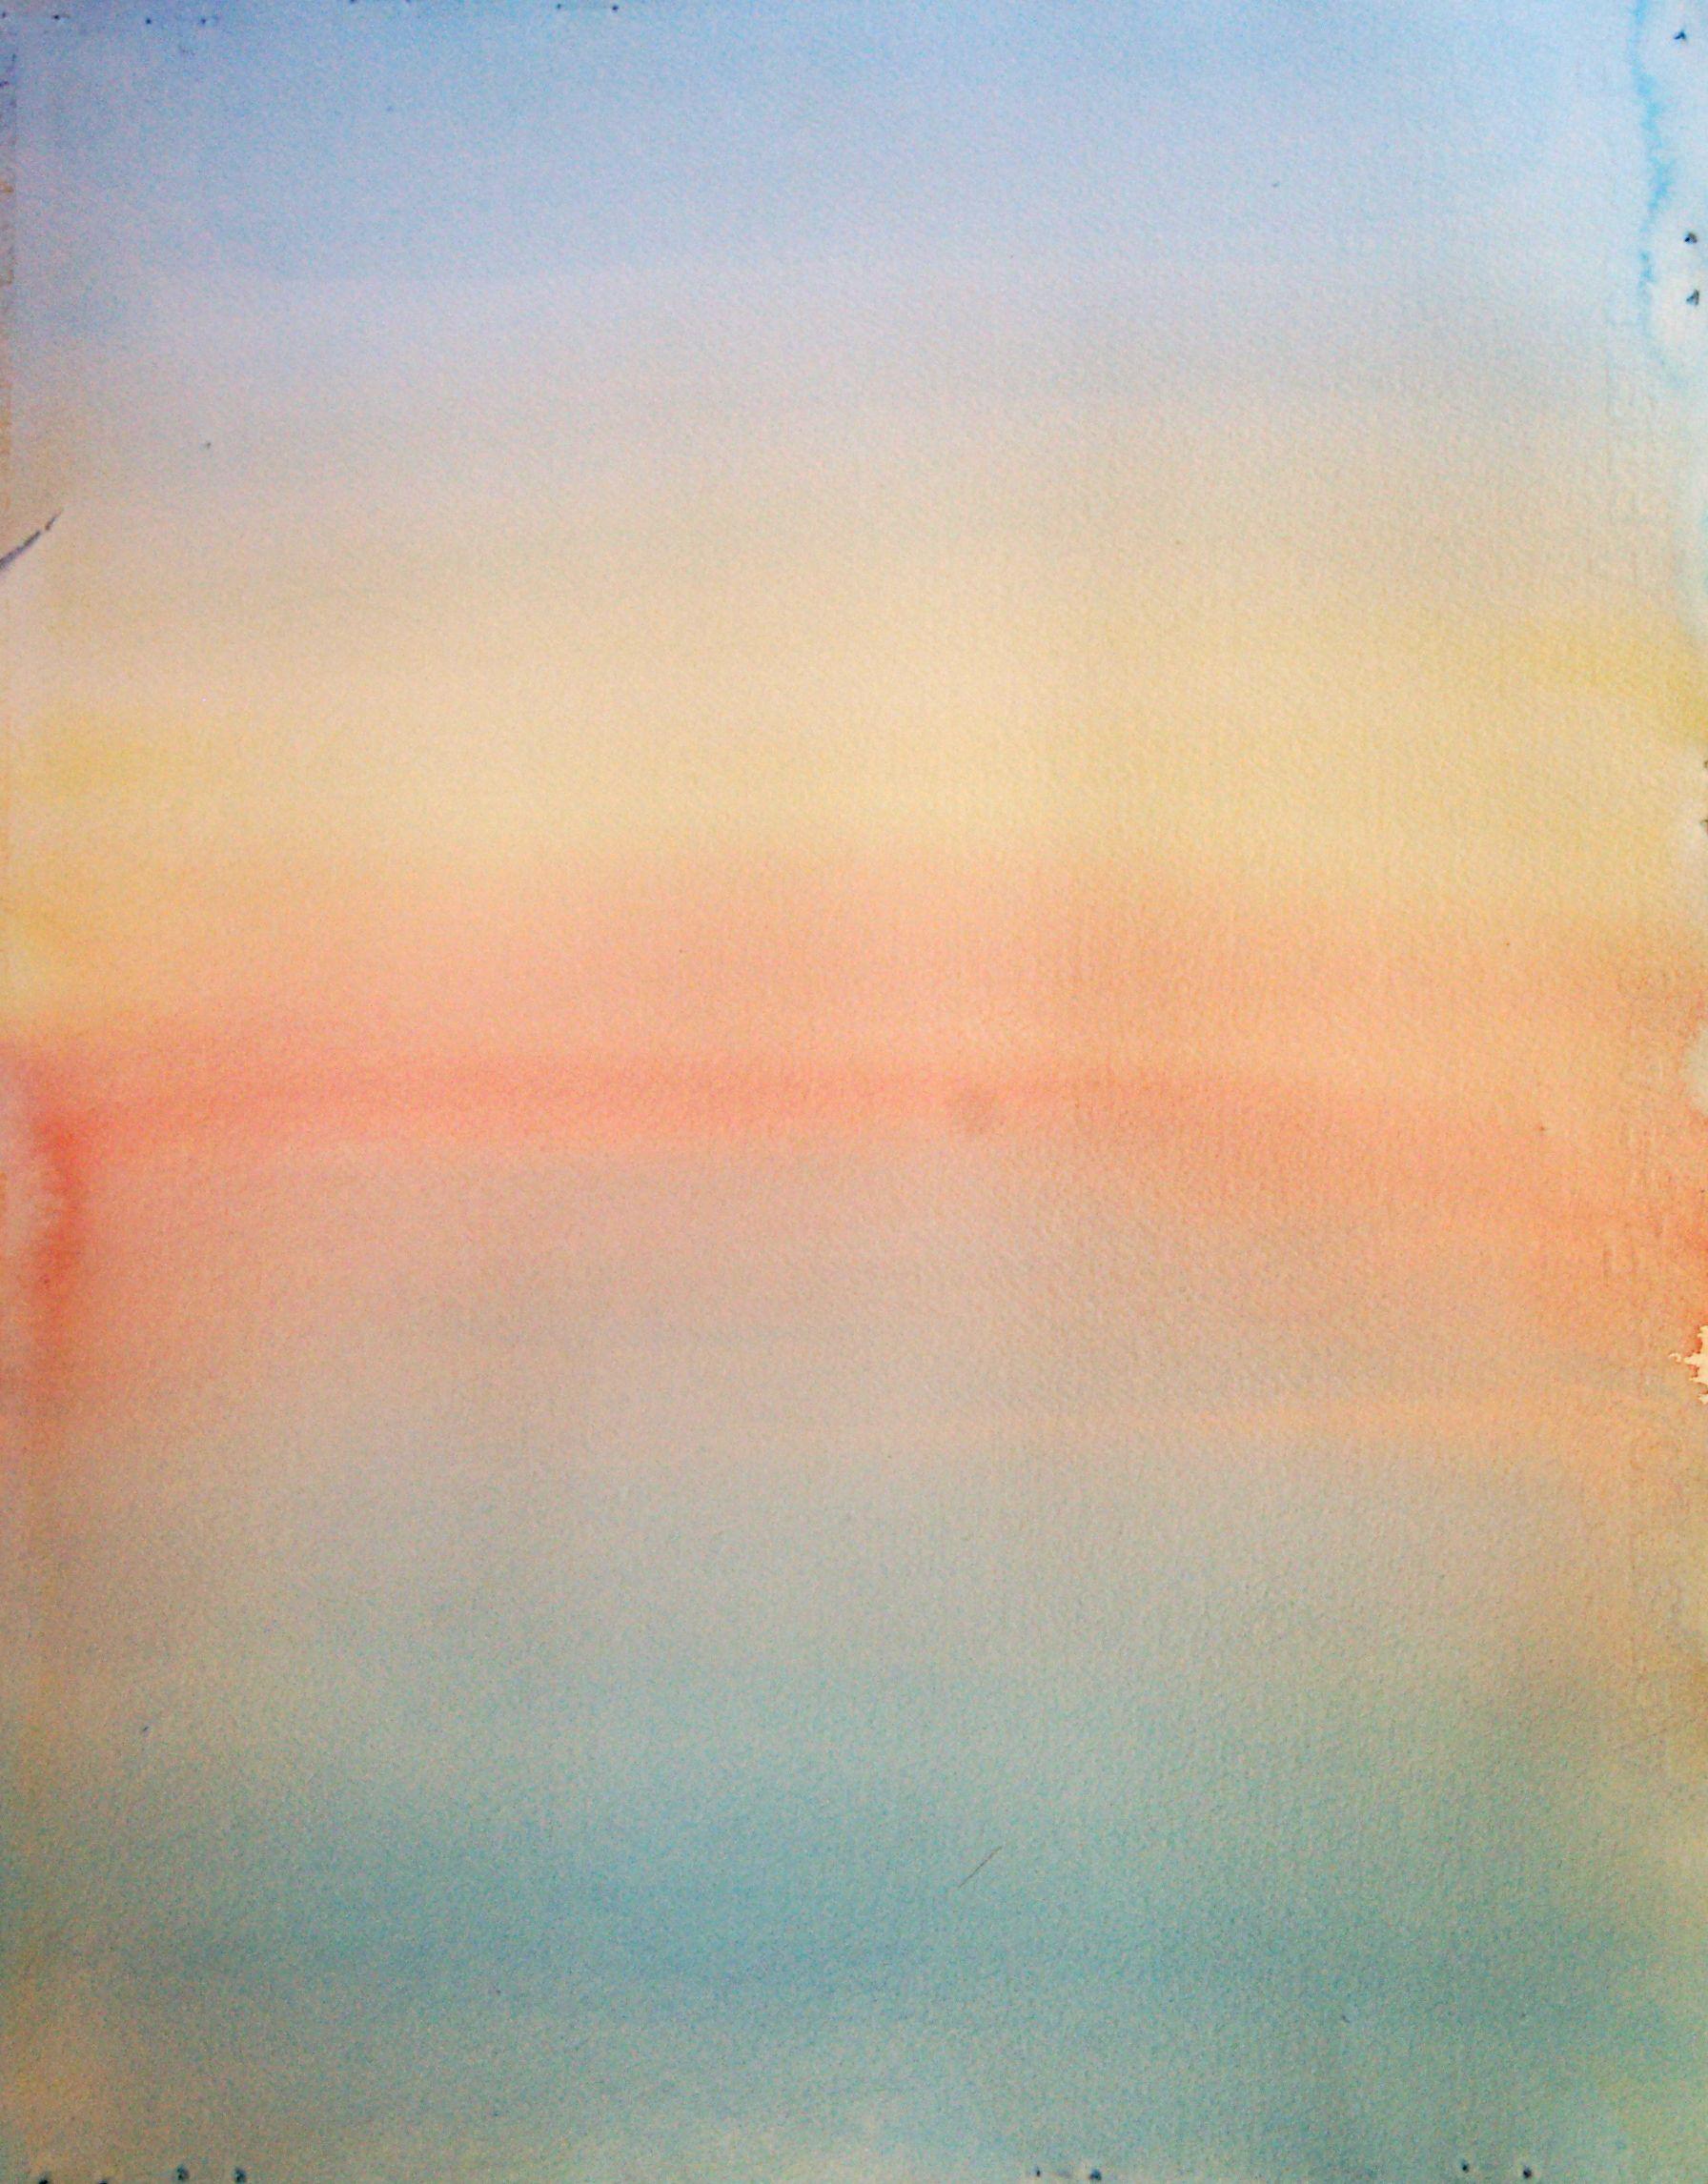 watercolor wash - Google Search | Death In Venice | Pinterest ...